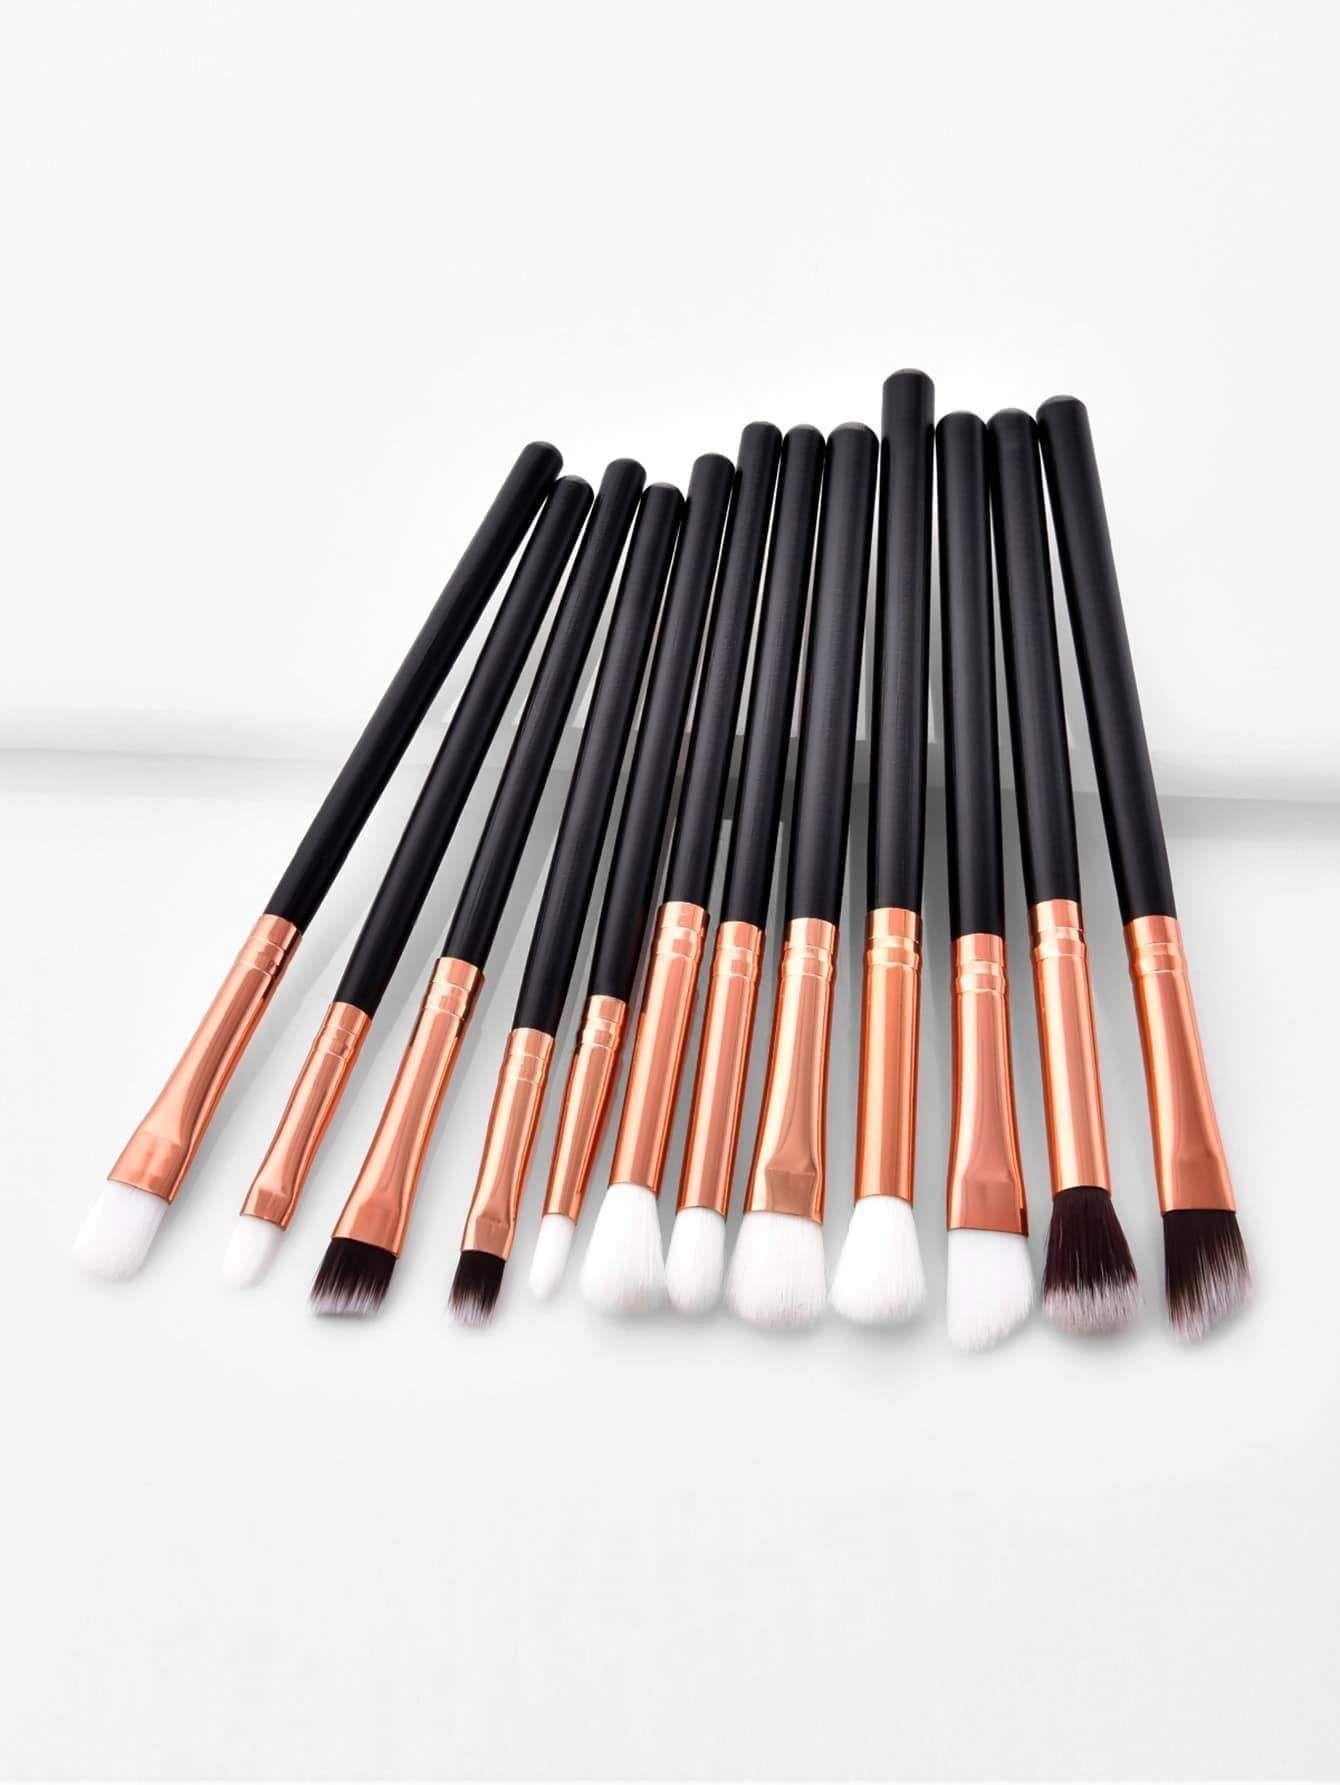 Soft Bristle Eye Brush 12Pcs Makeup Brushes Eye